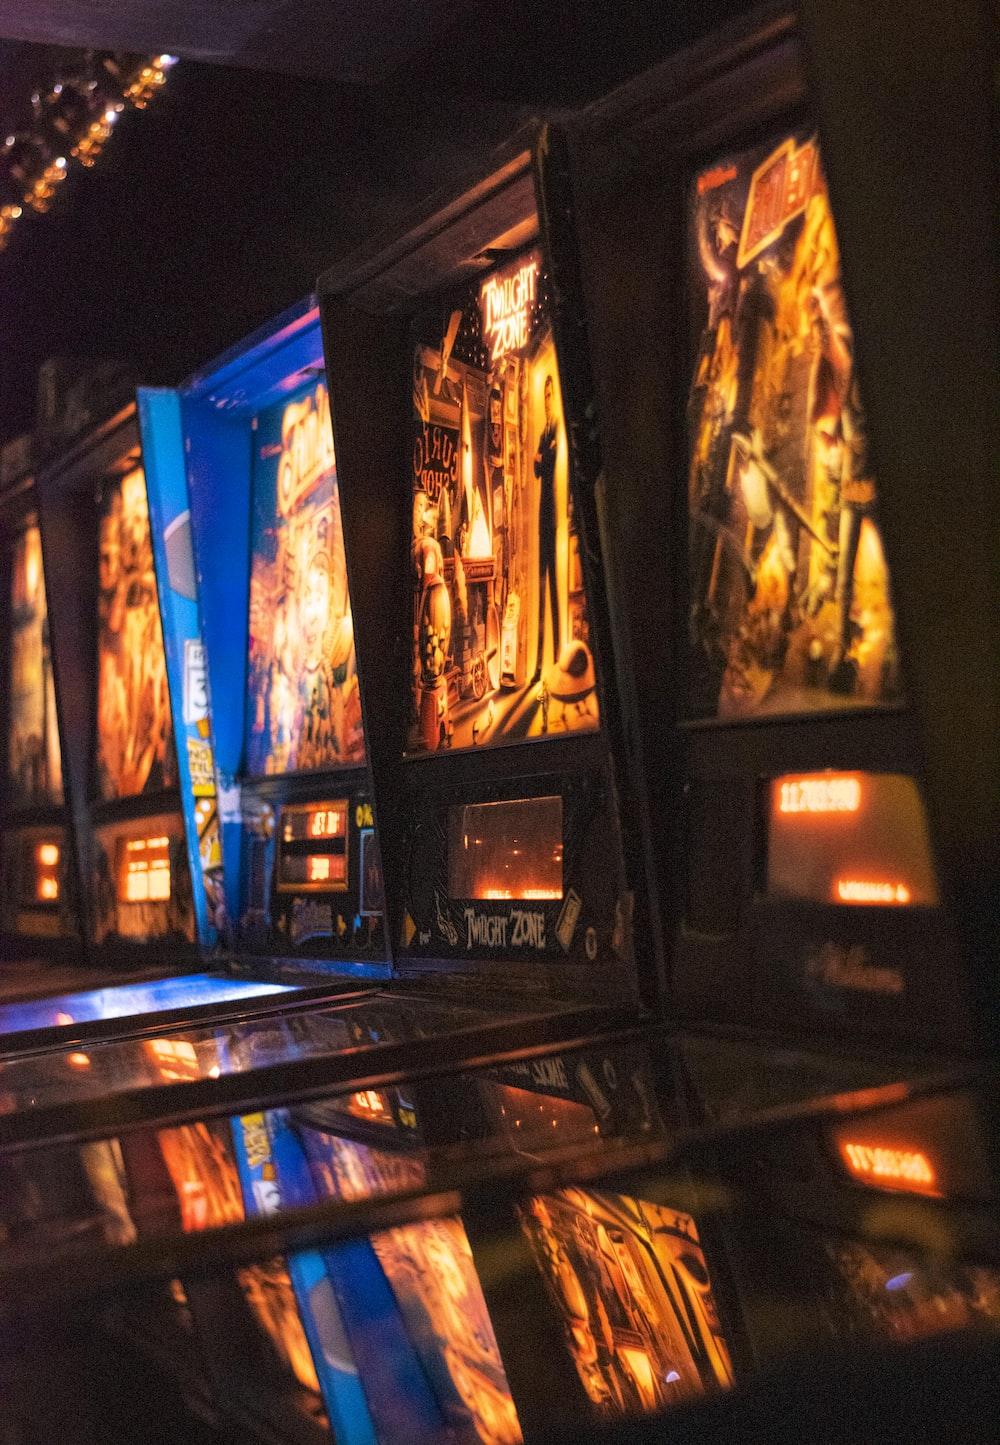 black and blue game machine